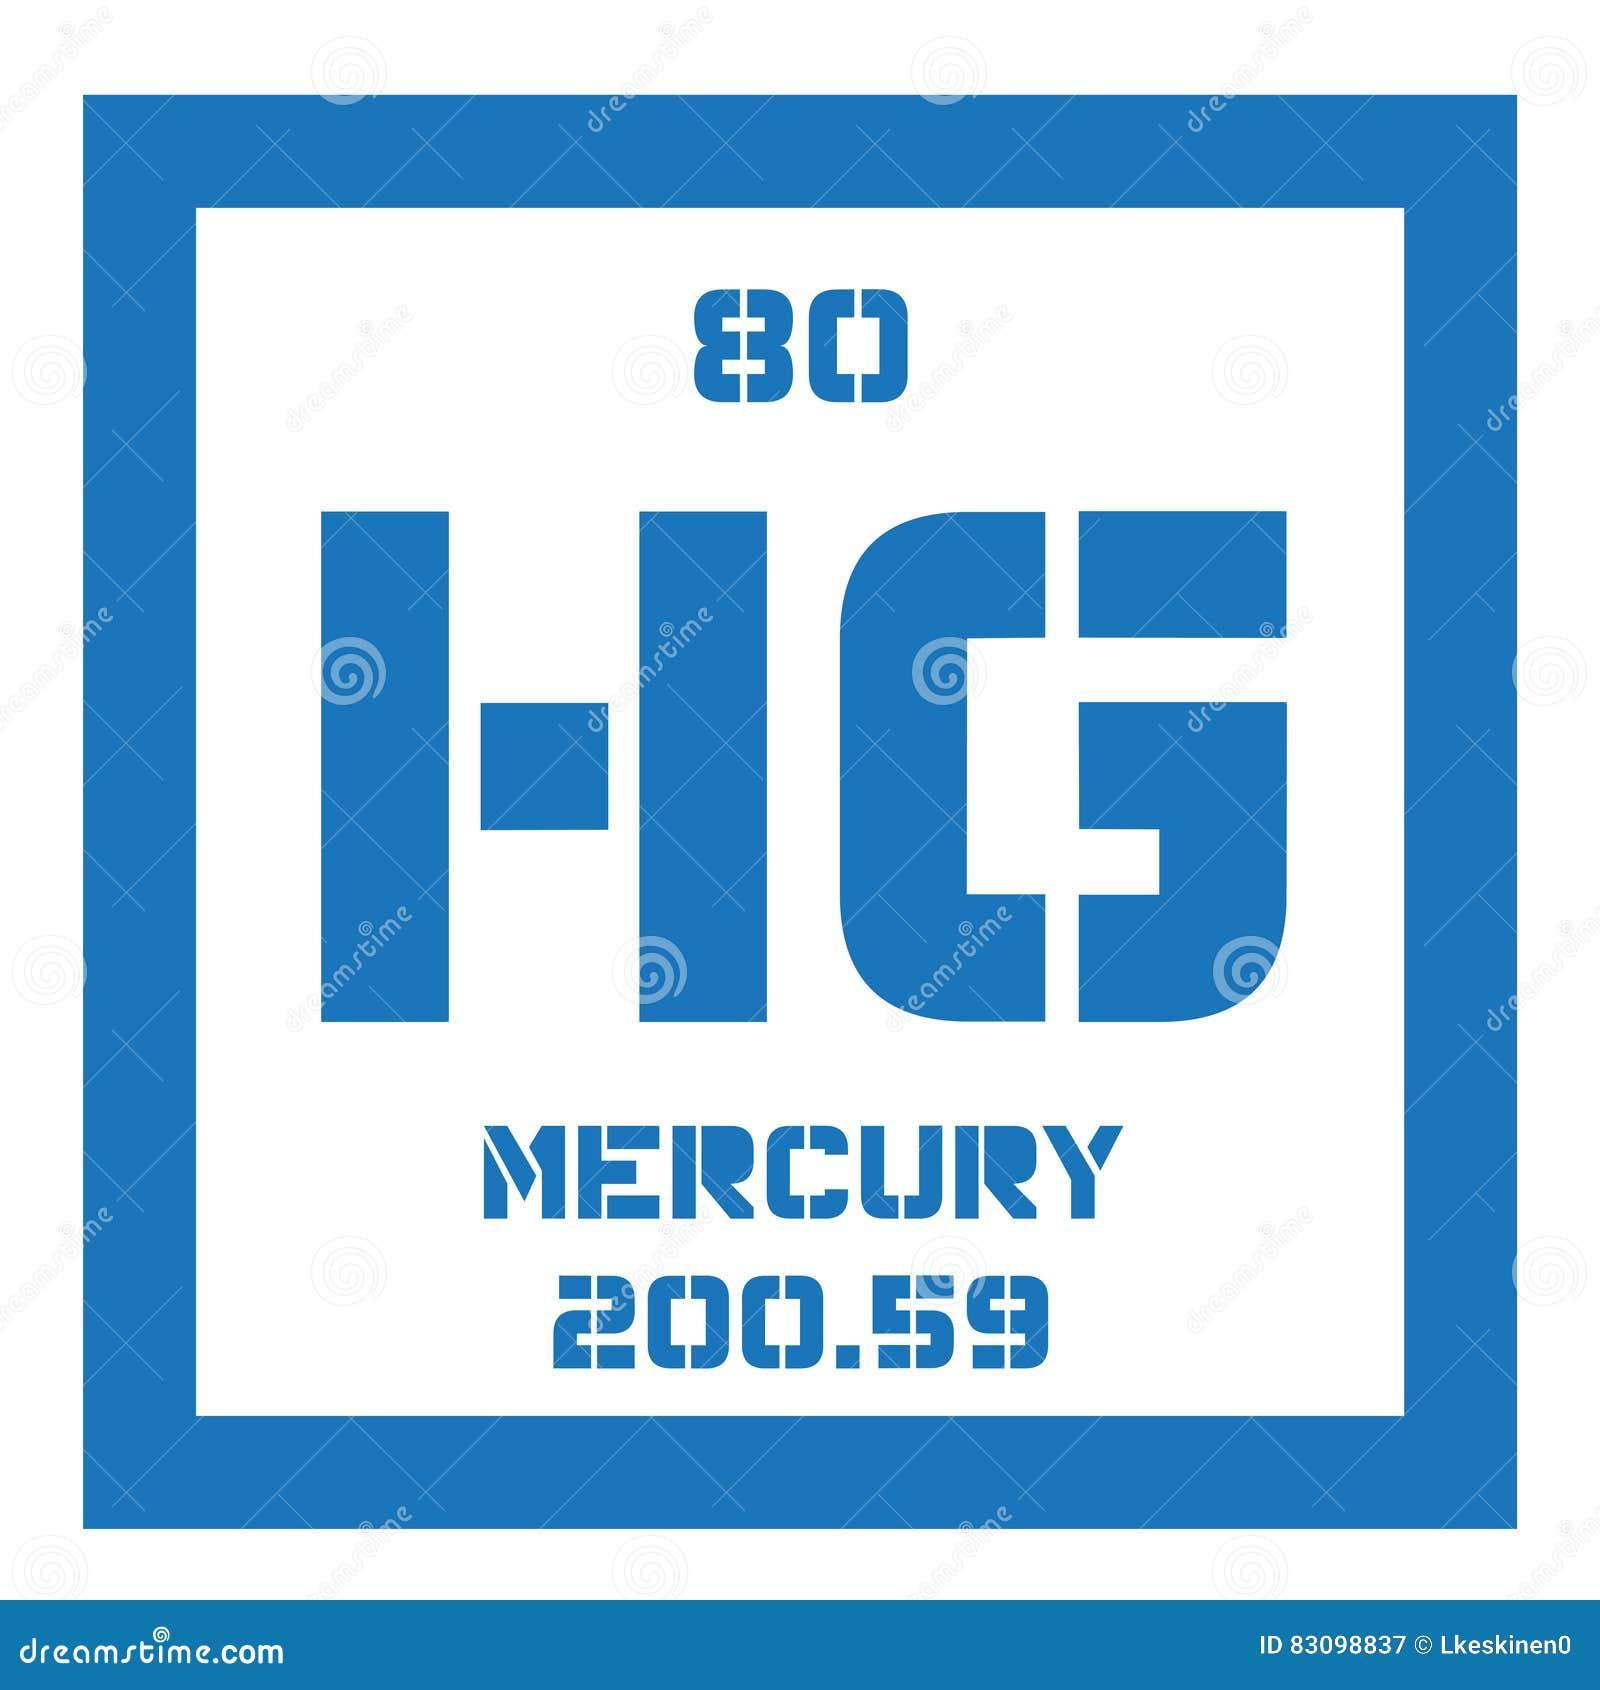 Mercury atomic symbol image collections symbol and sign ideas mercury atomic symbol choice image symbol and sign ideas mercury chemical element stock vector illustration of buycottarizona